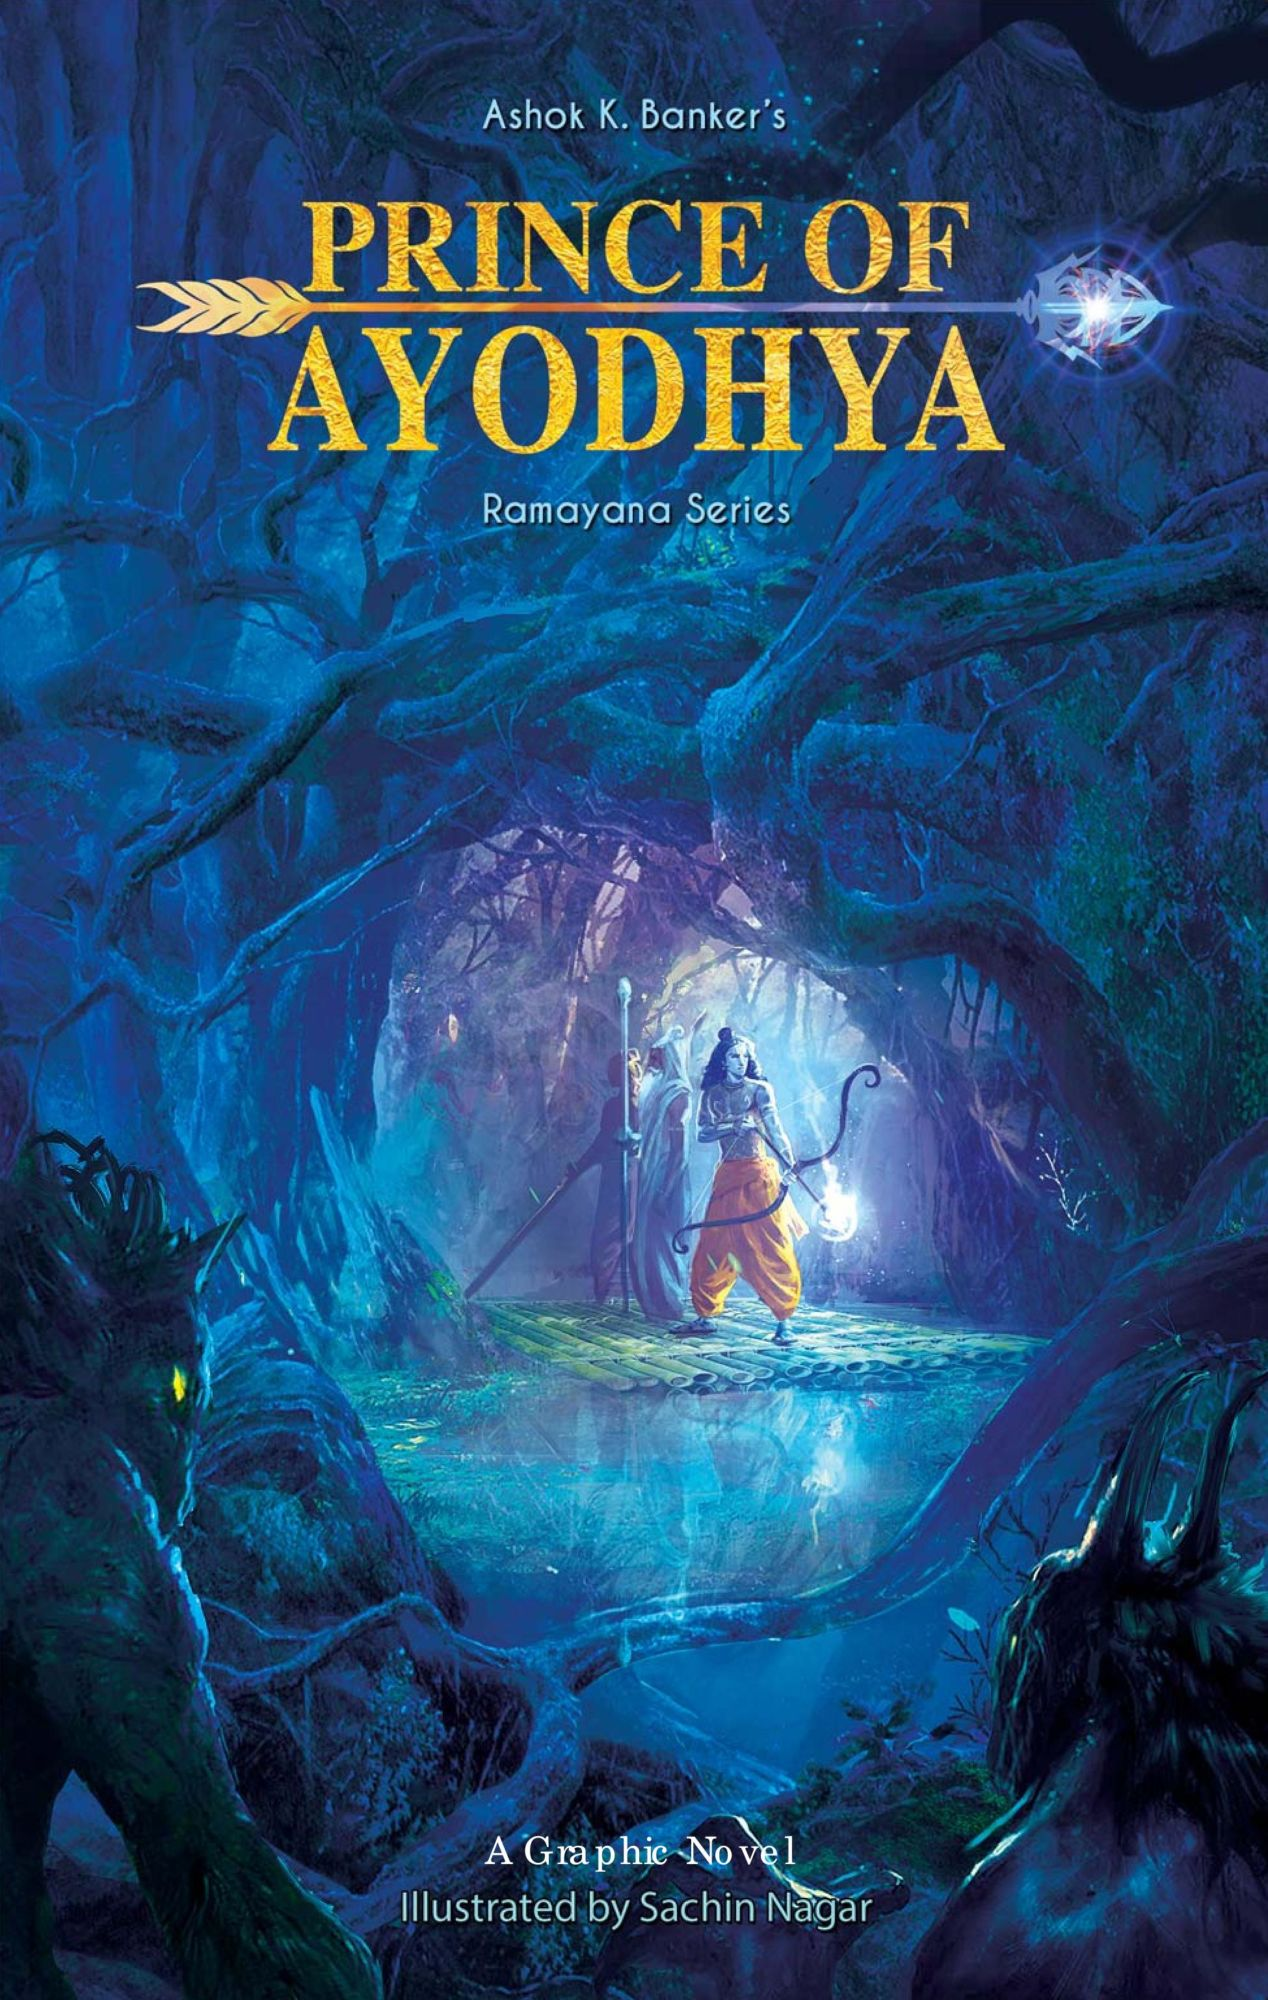 Ashok K Banker and Sachin Nagar Bring Ramayana to Comics With Prince of Ayodhya